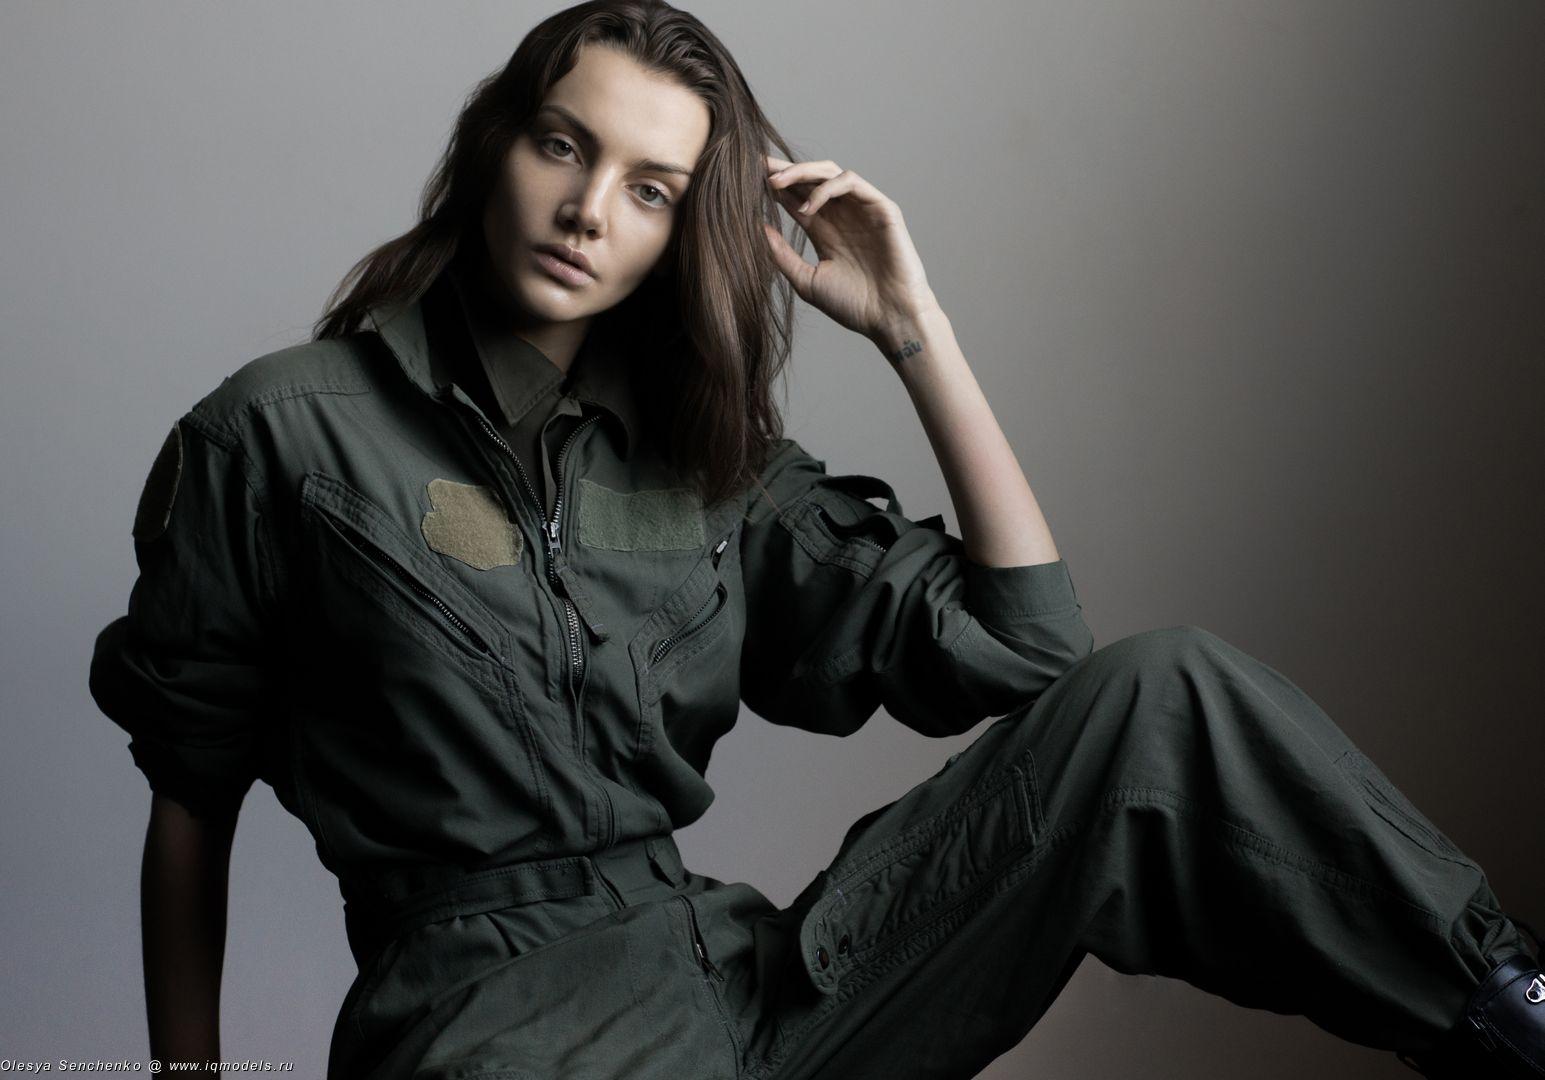 Irina Shnitman at London FW Fall 2018 - IQ Models Agency